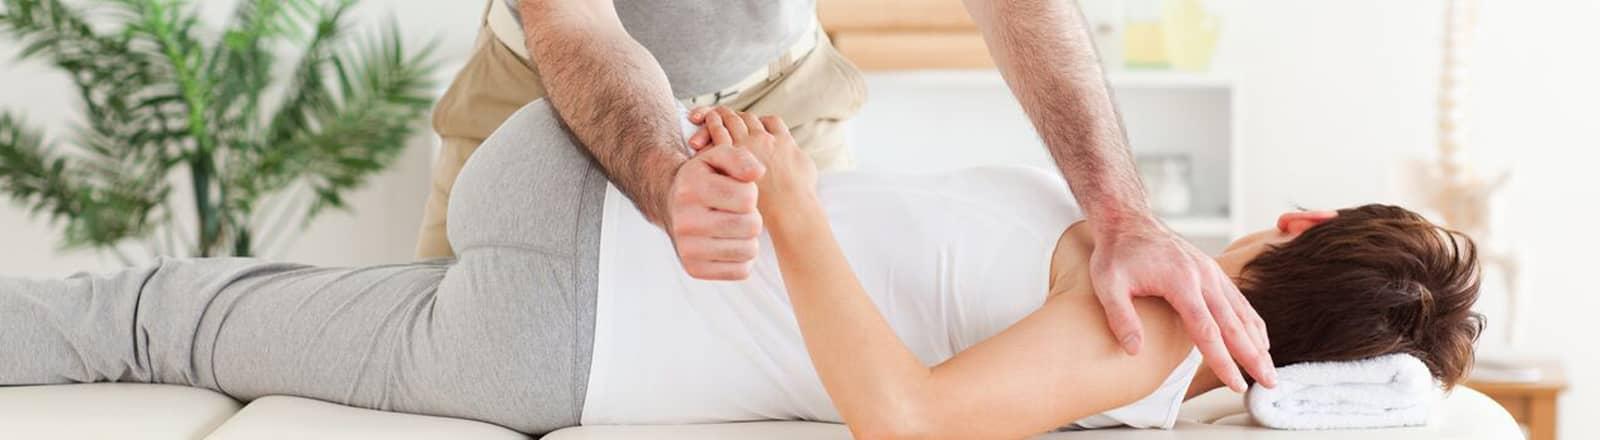 osteopatia atm Palma